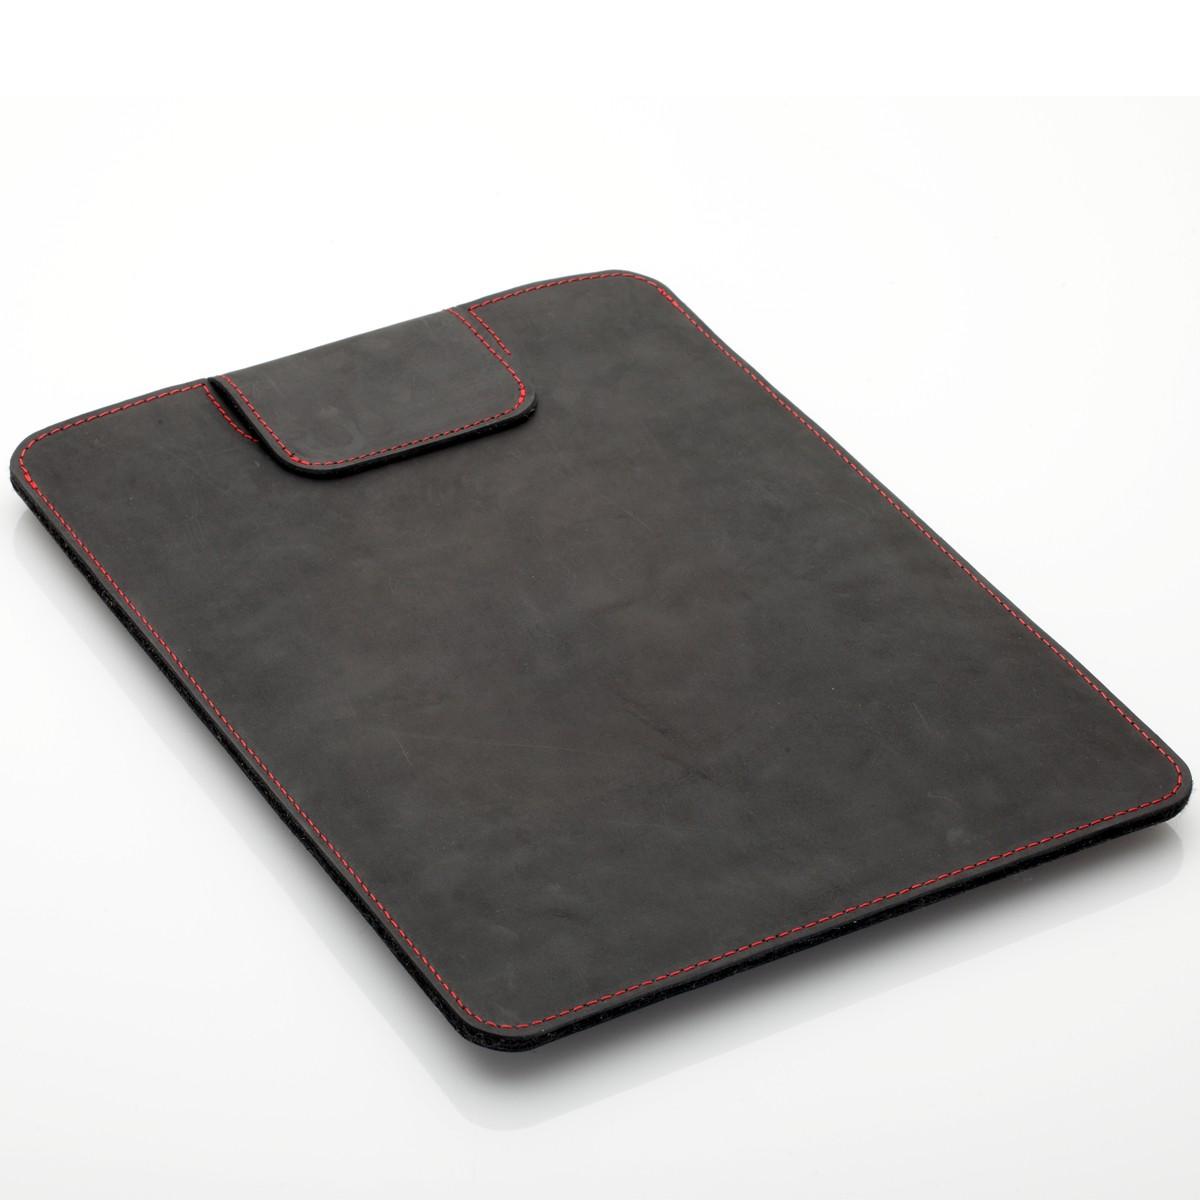 "iPad Lederhülle für iPad Air 10,9"", iPad 10,2"", iPad Pro 11"" und iPad Pro 10,5"""